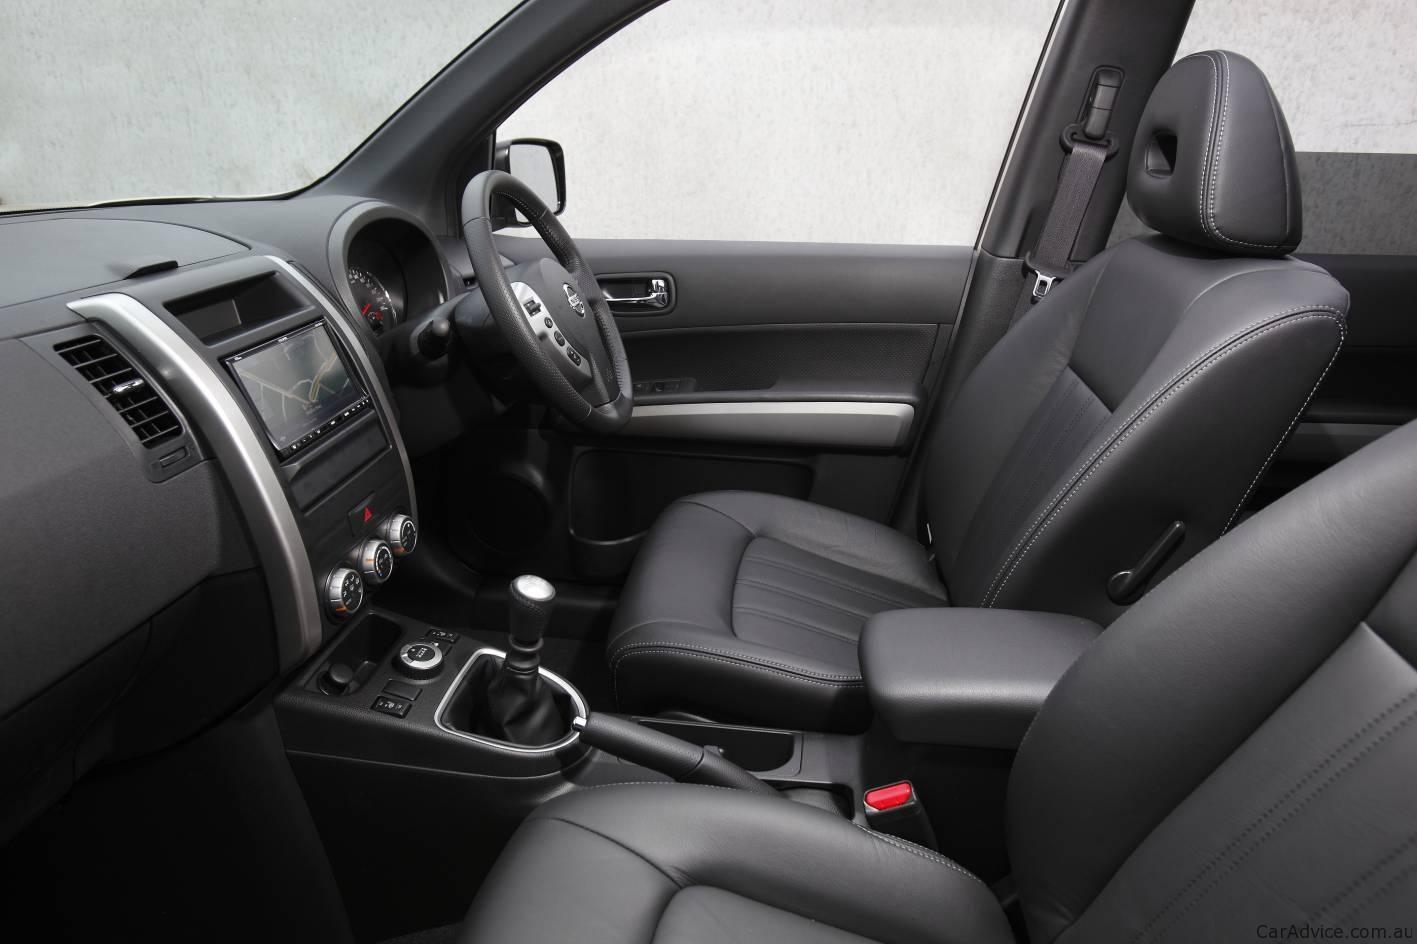 2010 Nissan X-Trail update - photos | CarAdvice